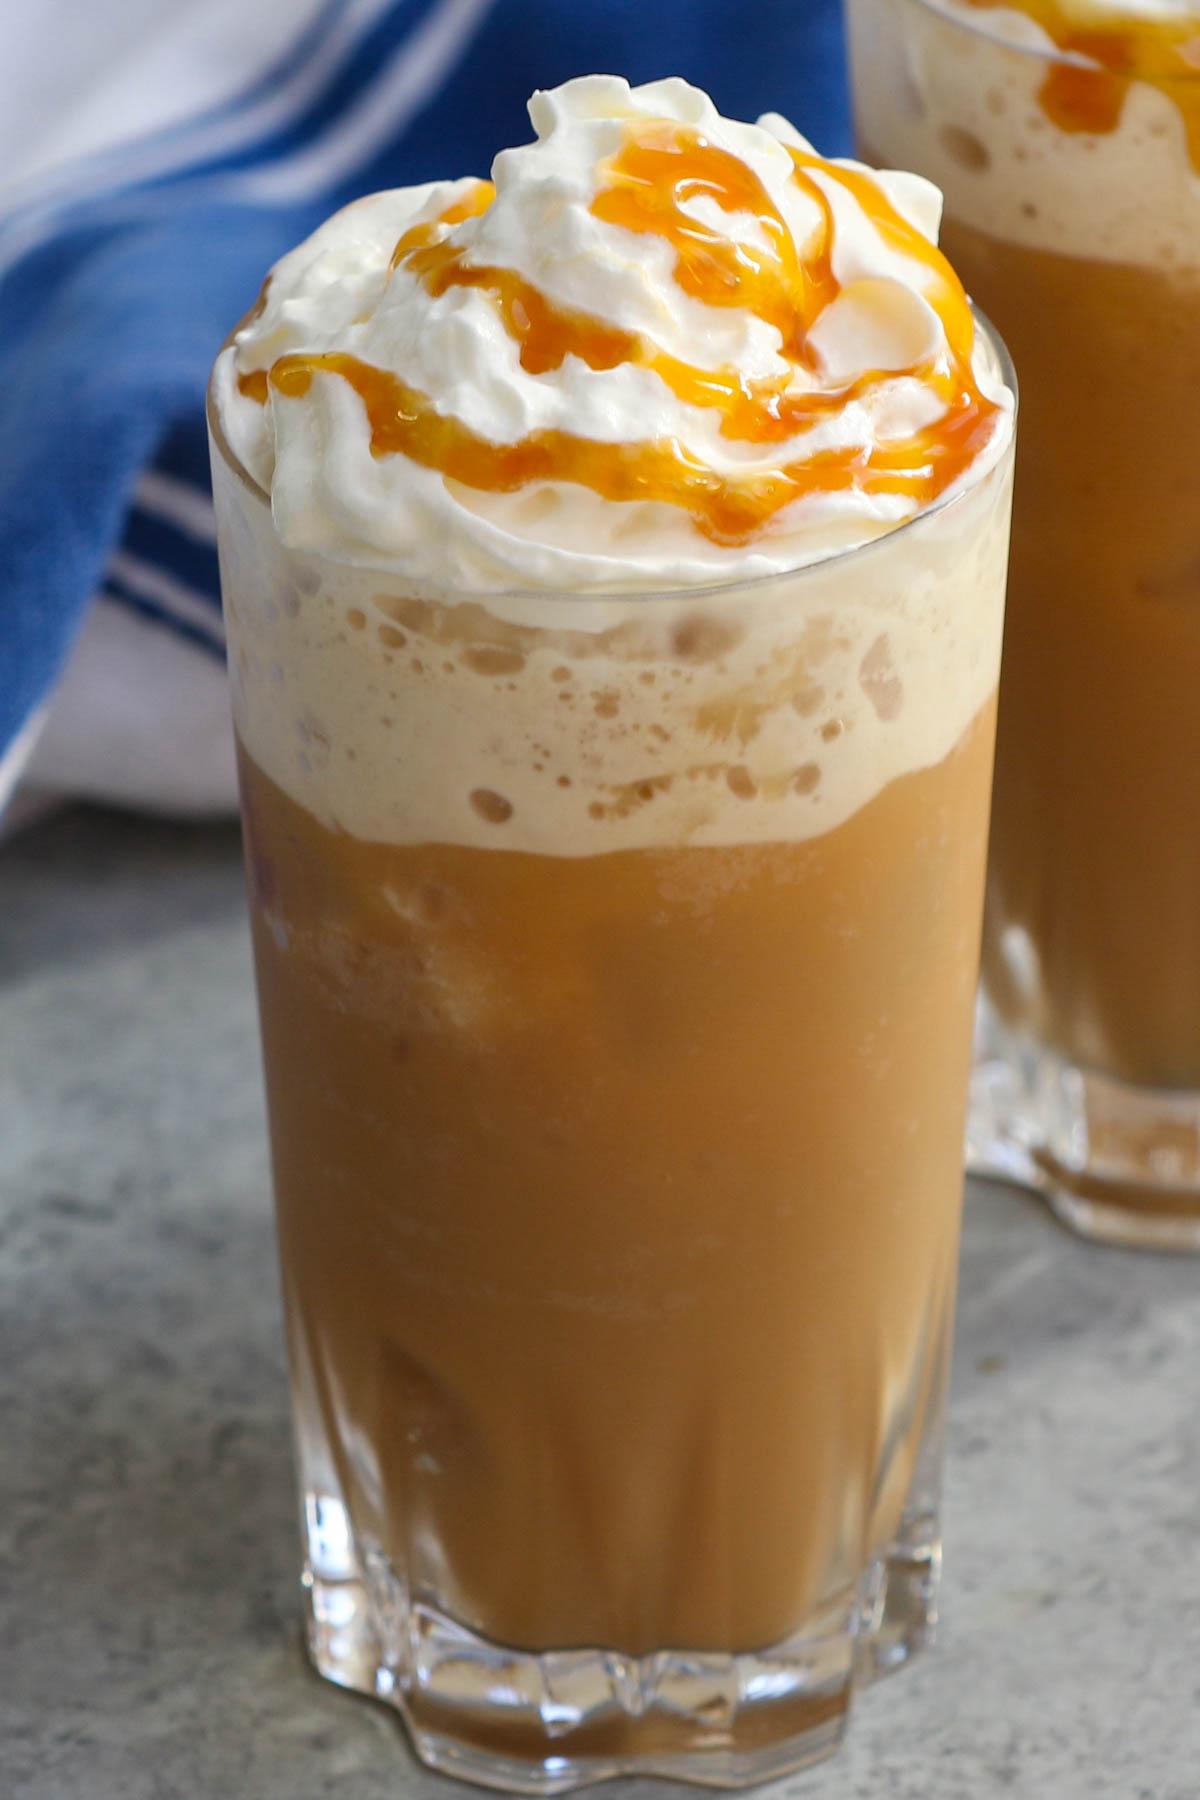 Best Homemade Caramel Frappe Starbucks Caramel Frappuccino Copycat Recipe